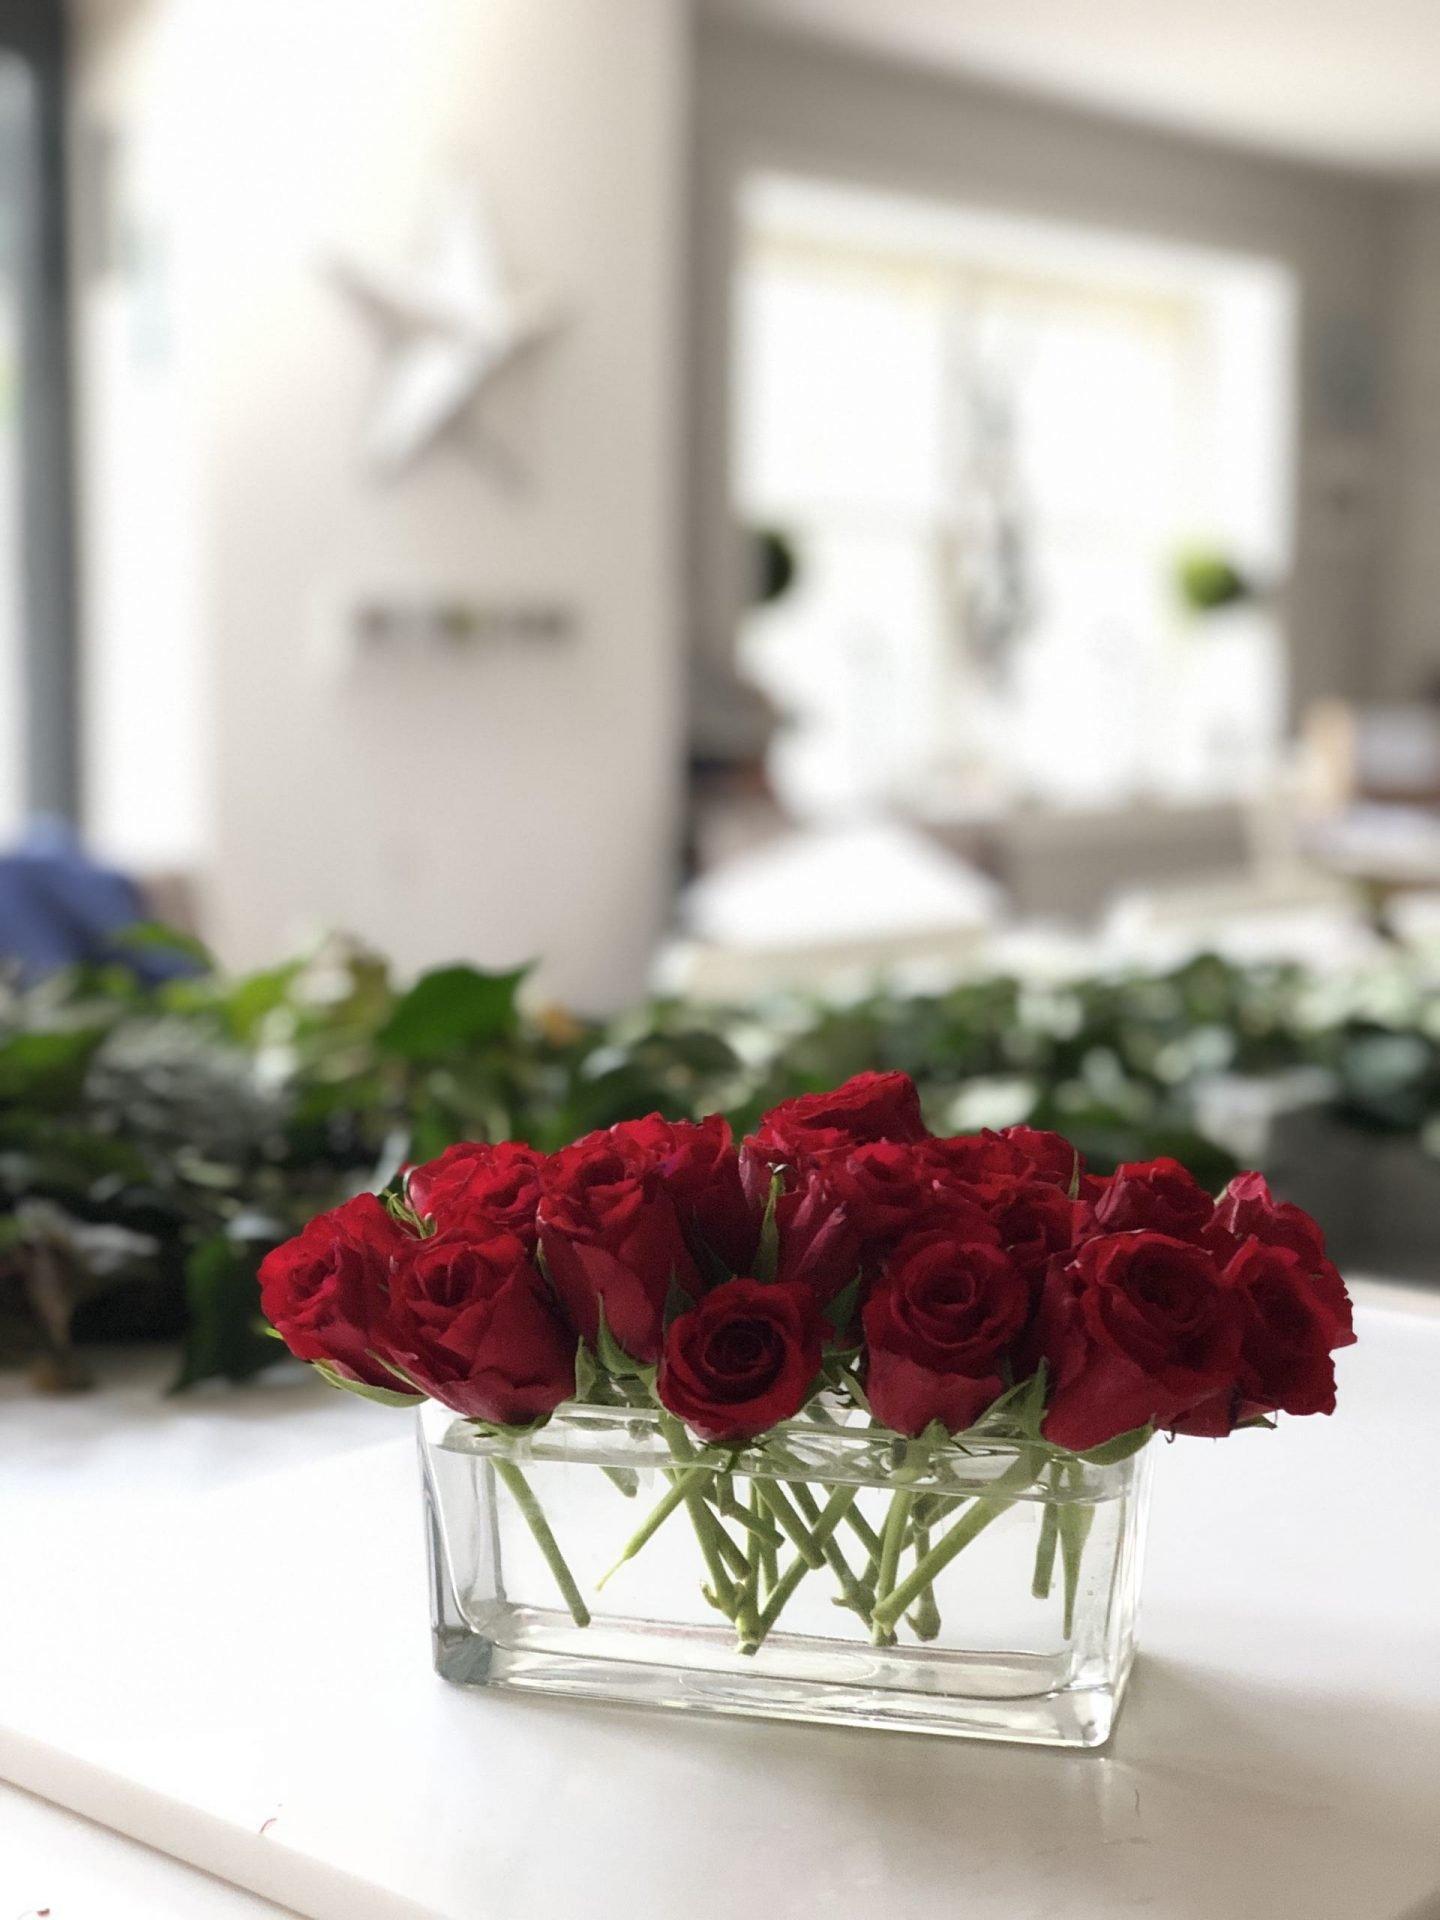 Red rose display by Jp Clark